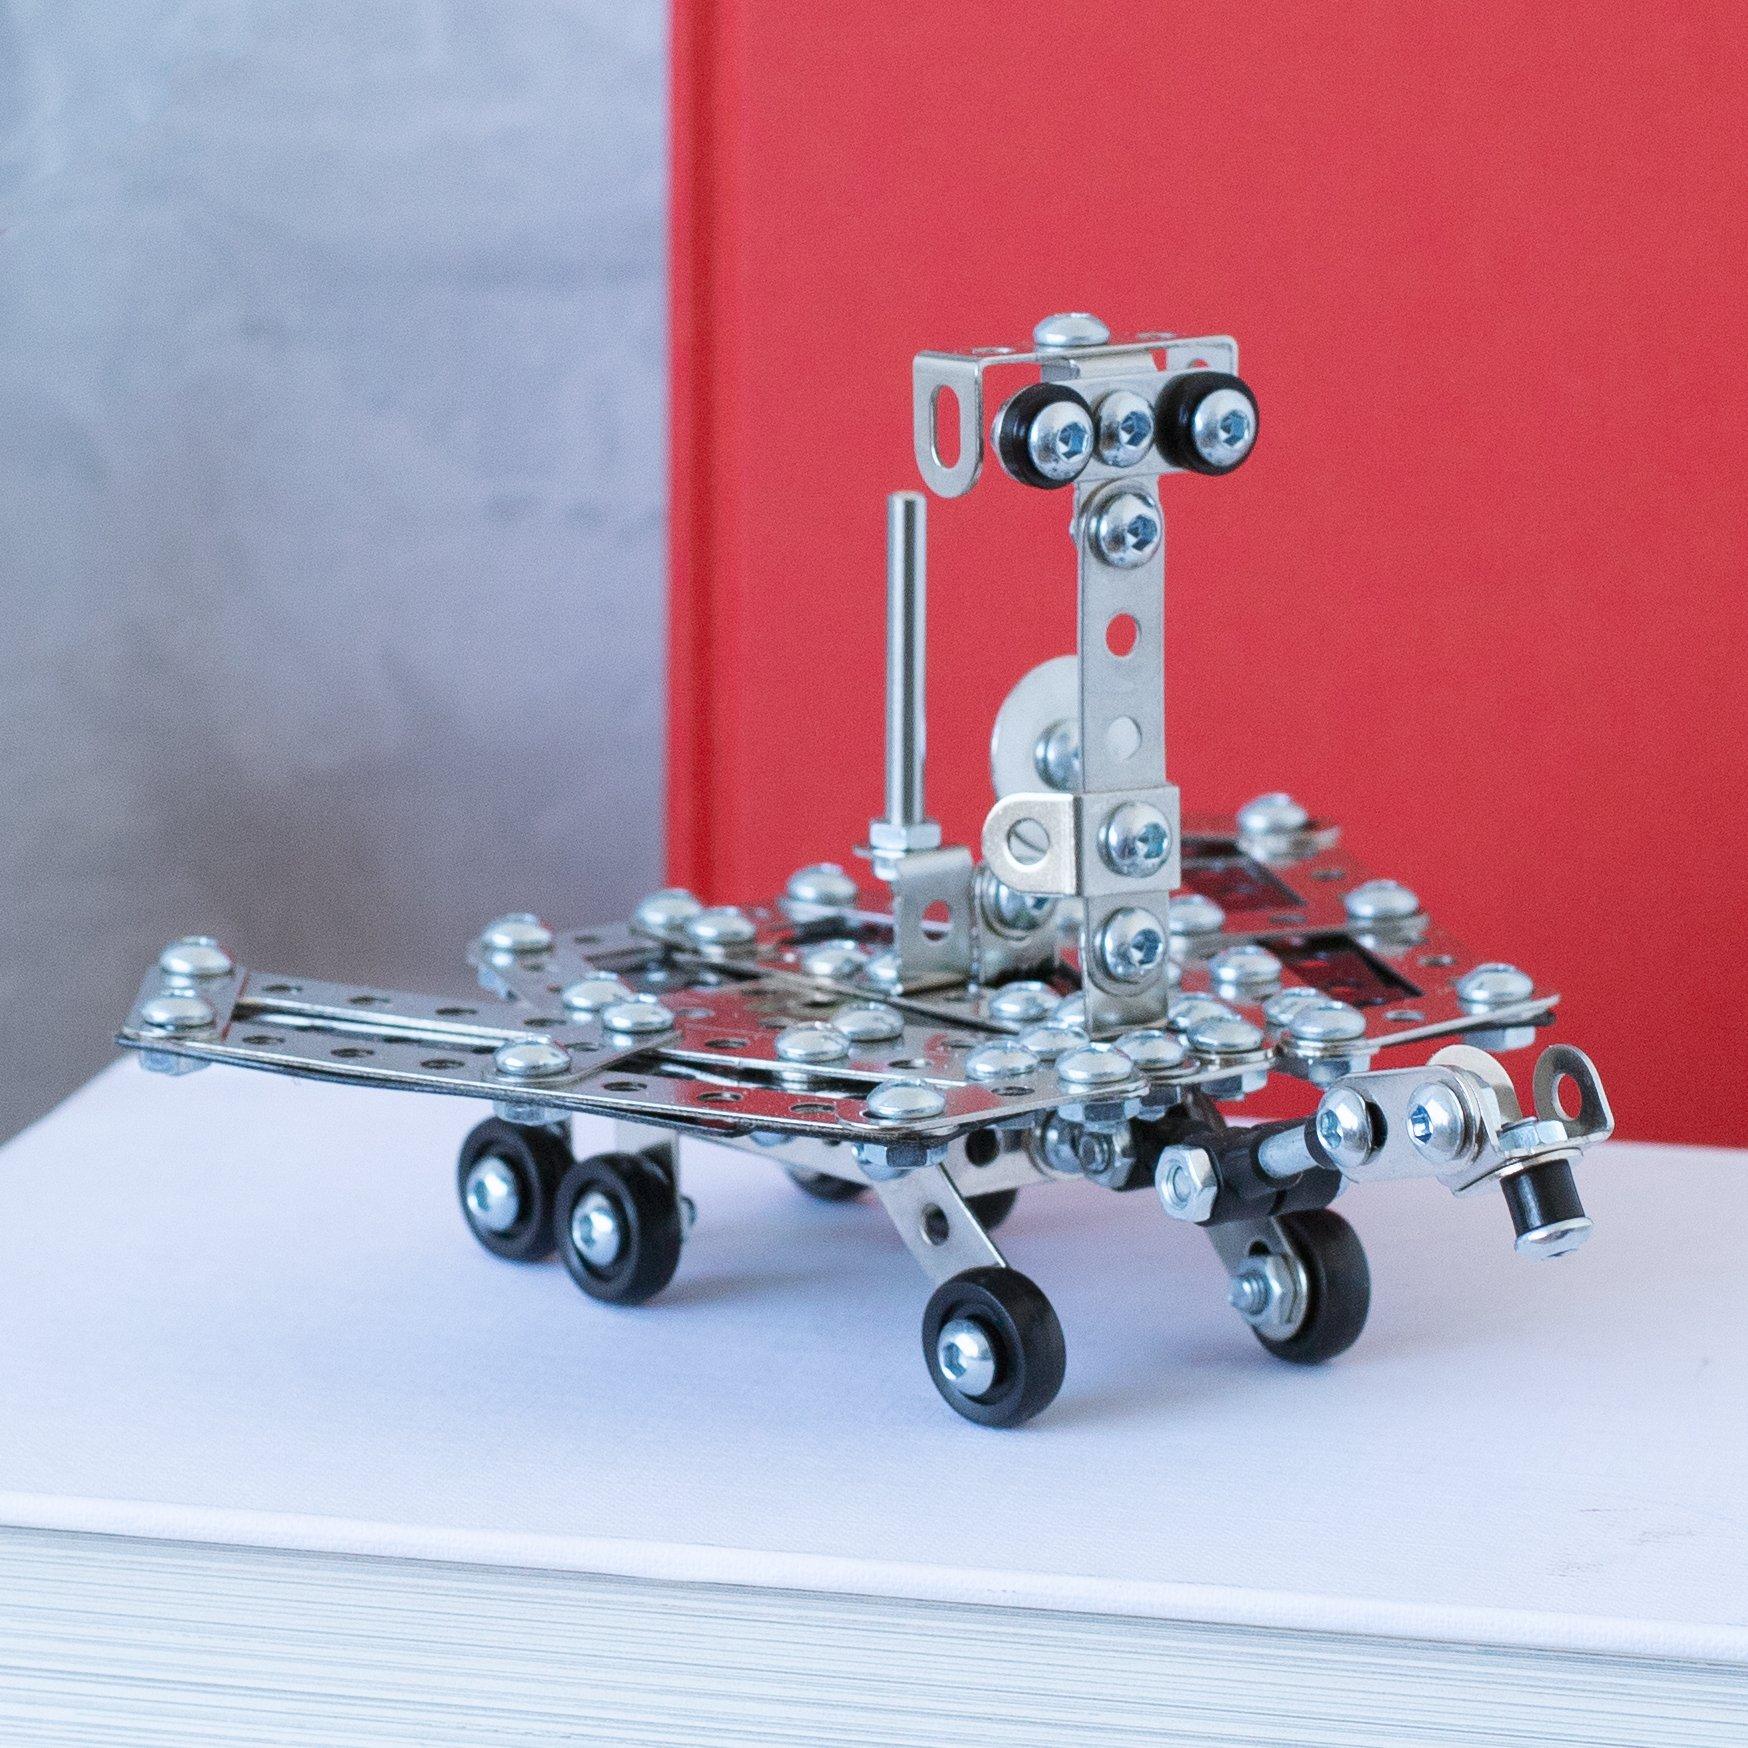 NASA Mars Rover Construction Kit(NASABYORV)